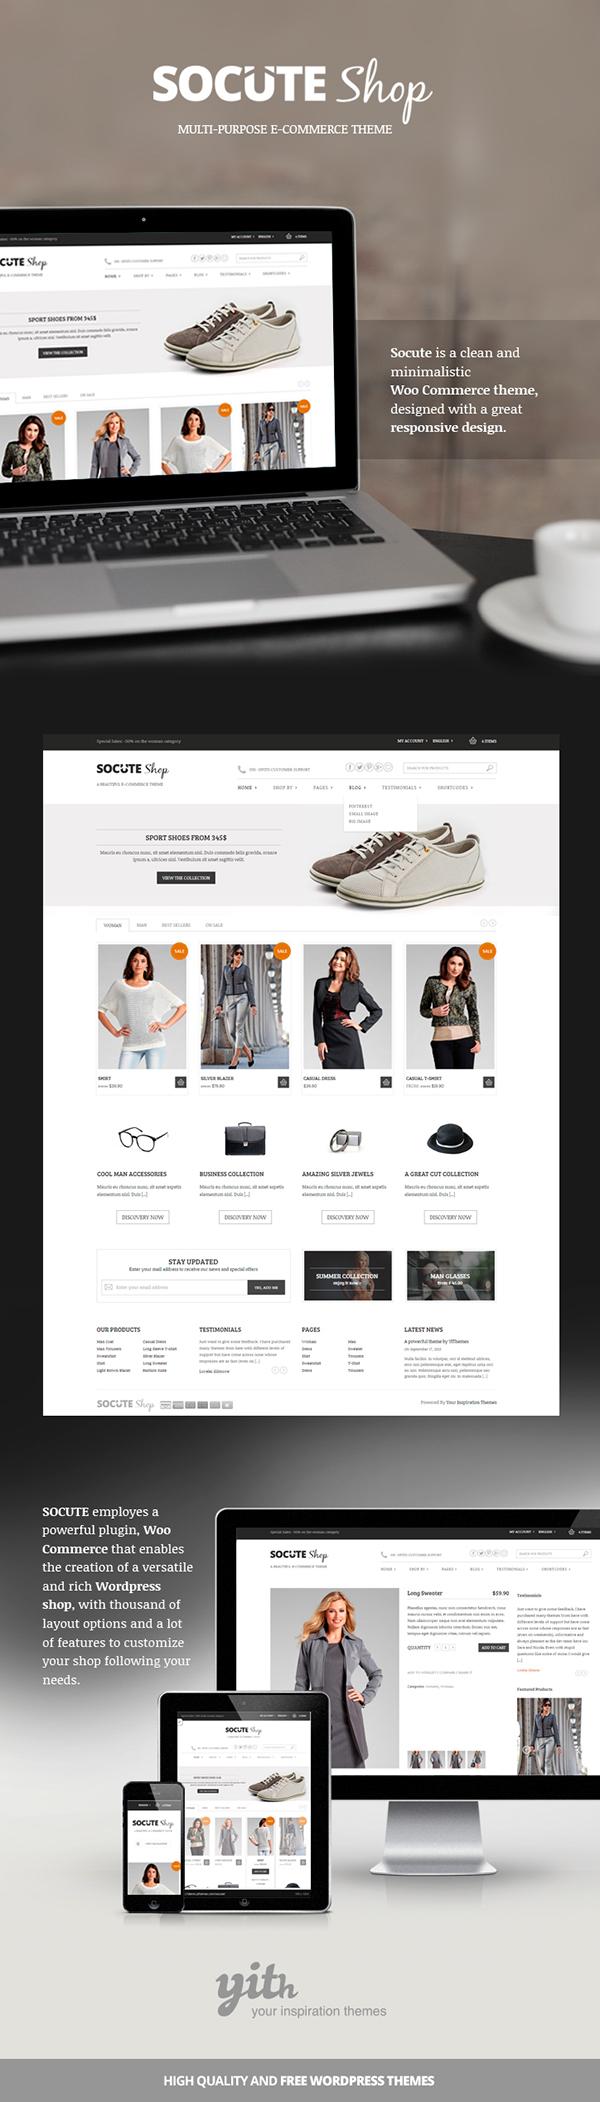 Socute shop: Multi-purpose E-commerce Theme on Behance